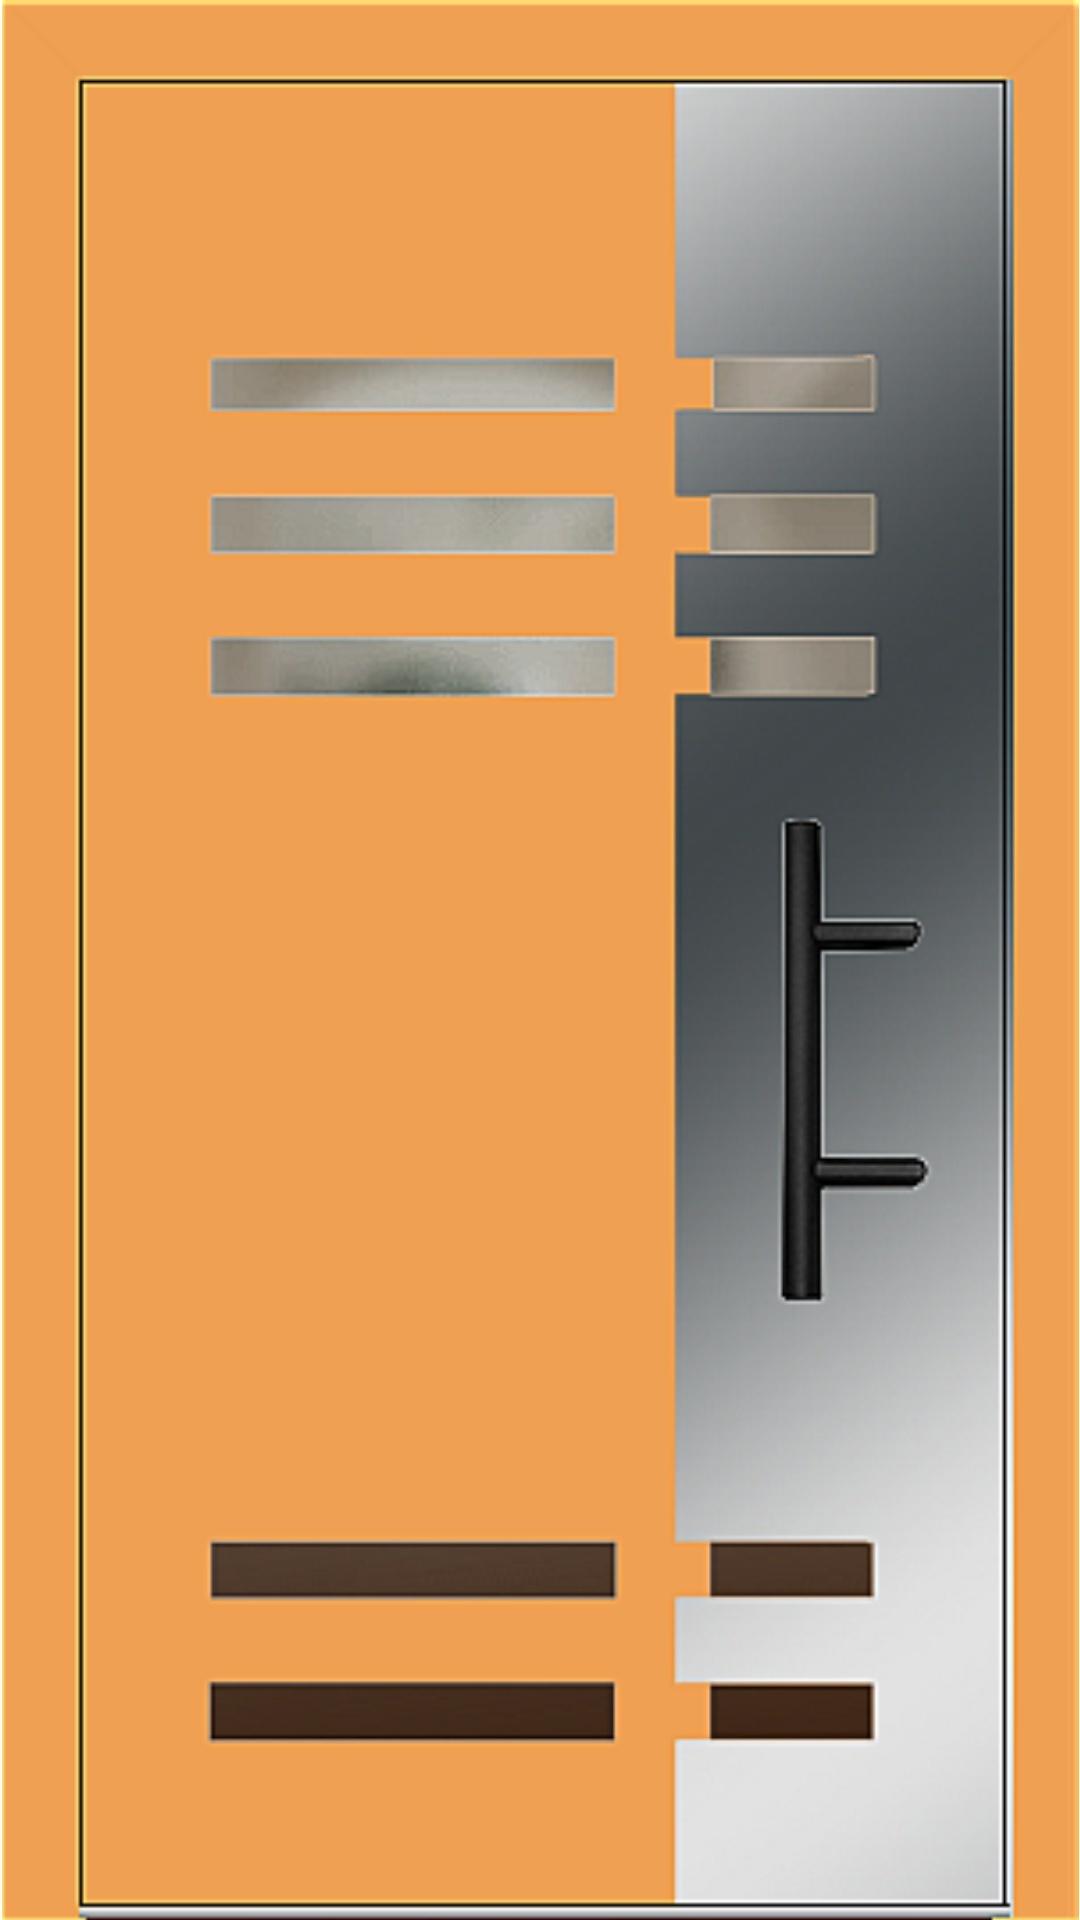 Holz-Alu Haustür Modell 66501 safrangelb